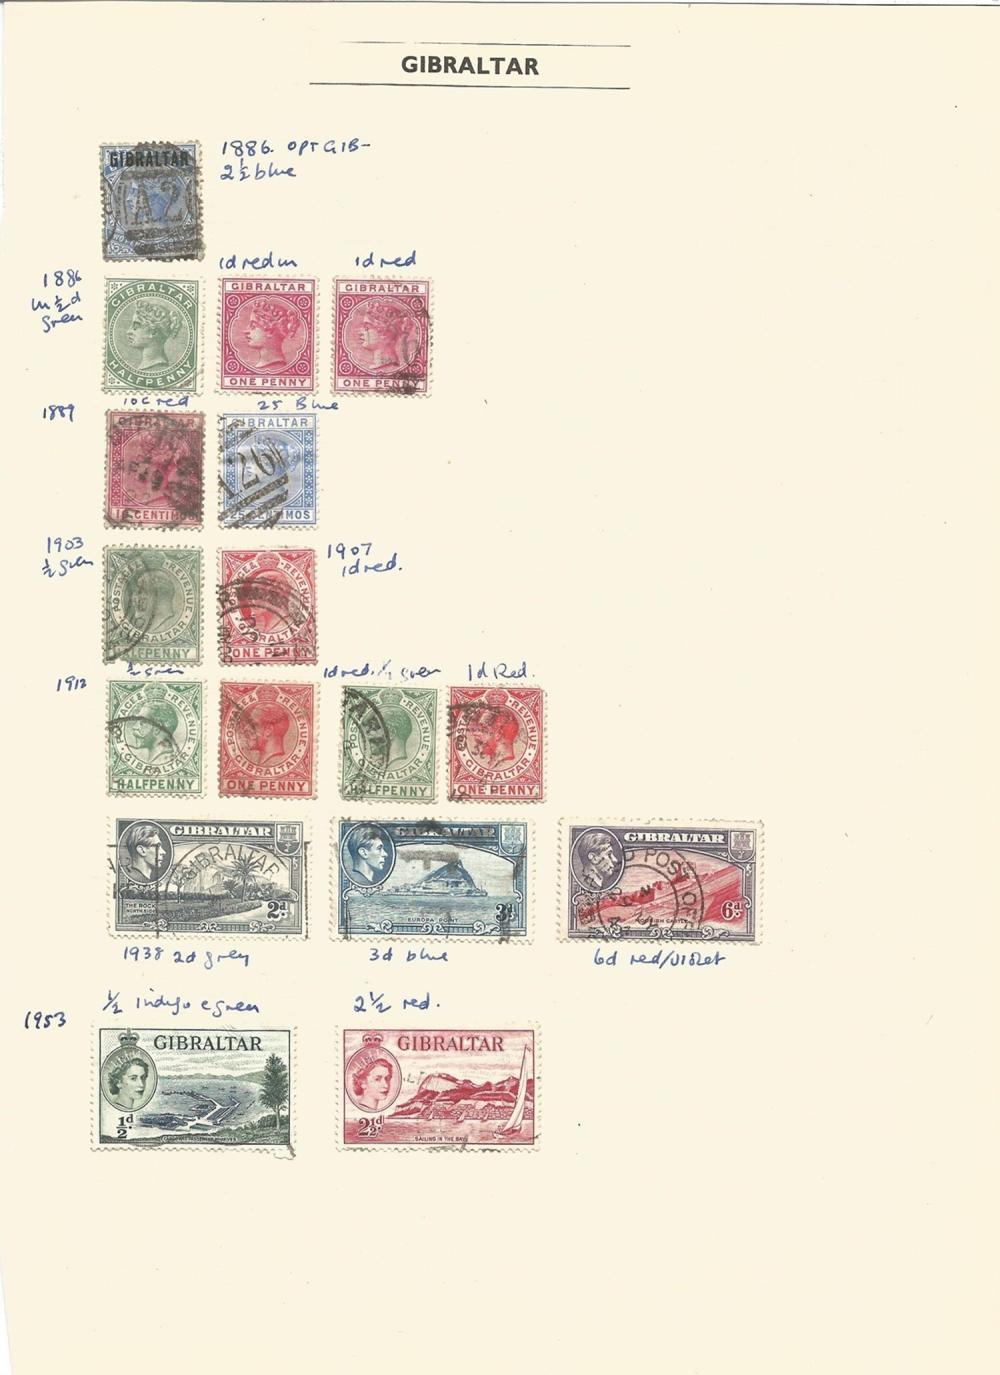 Bermuda, St Vincent, Bahamas, Barbados, British Guiana, Cape of Good Hope, Gibraltar, stamps on